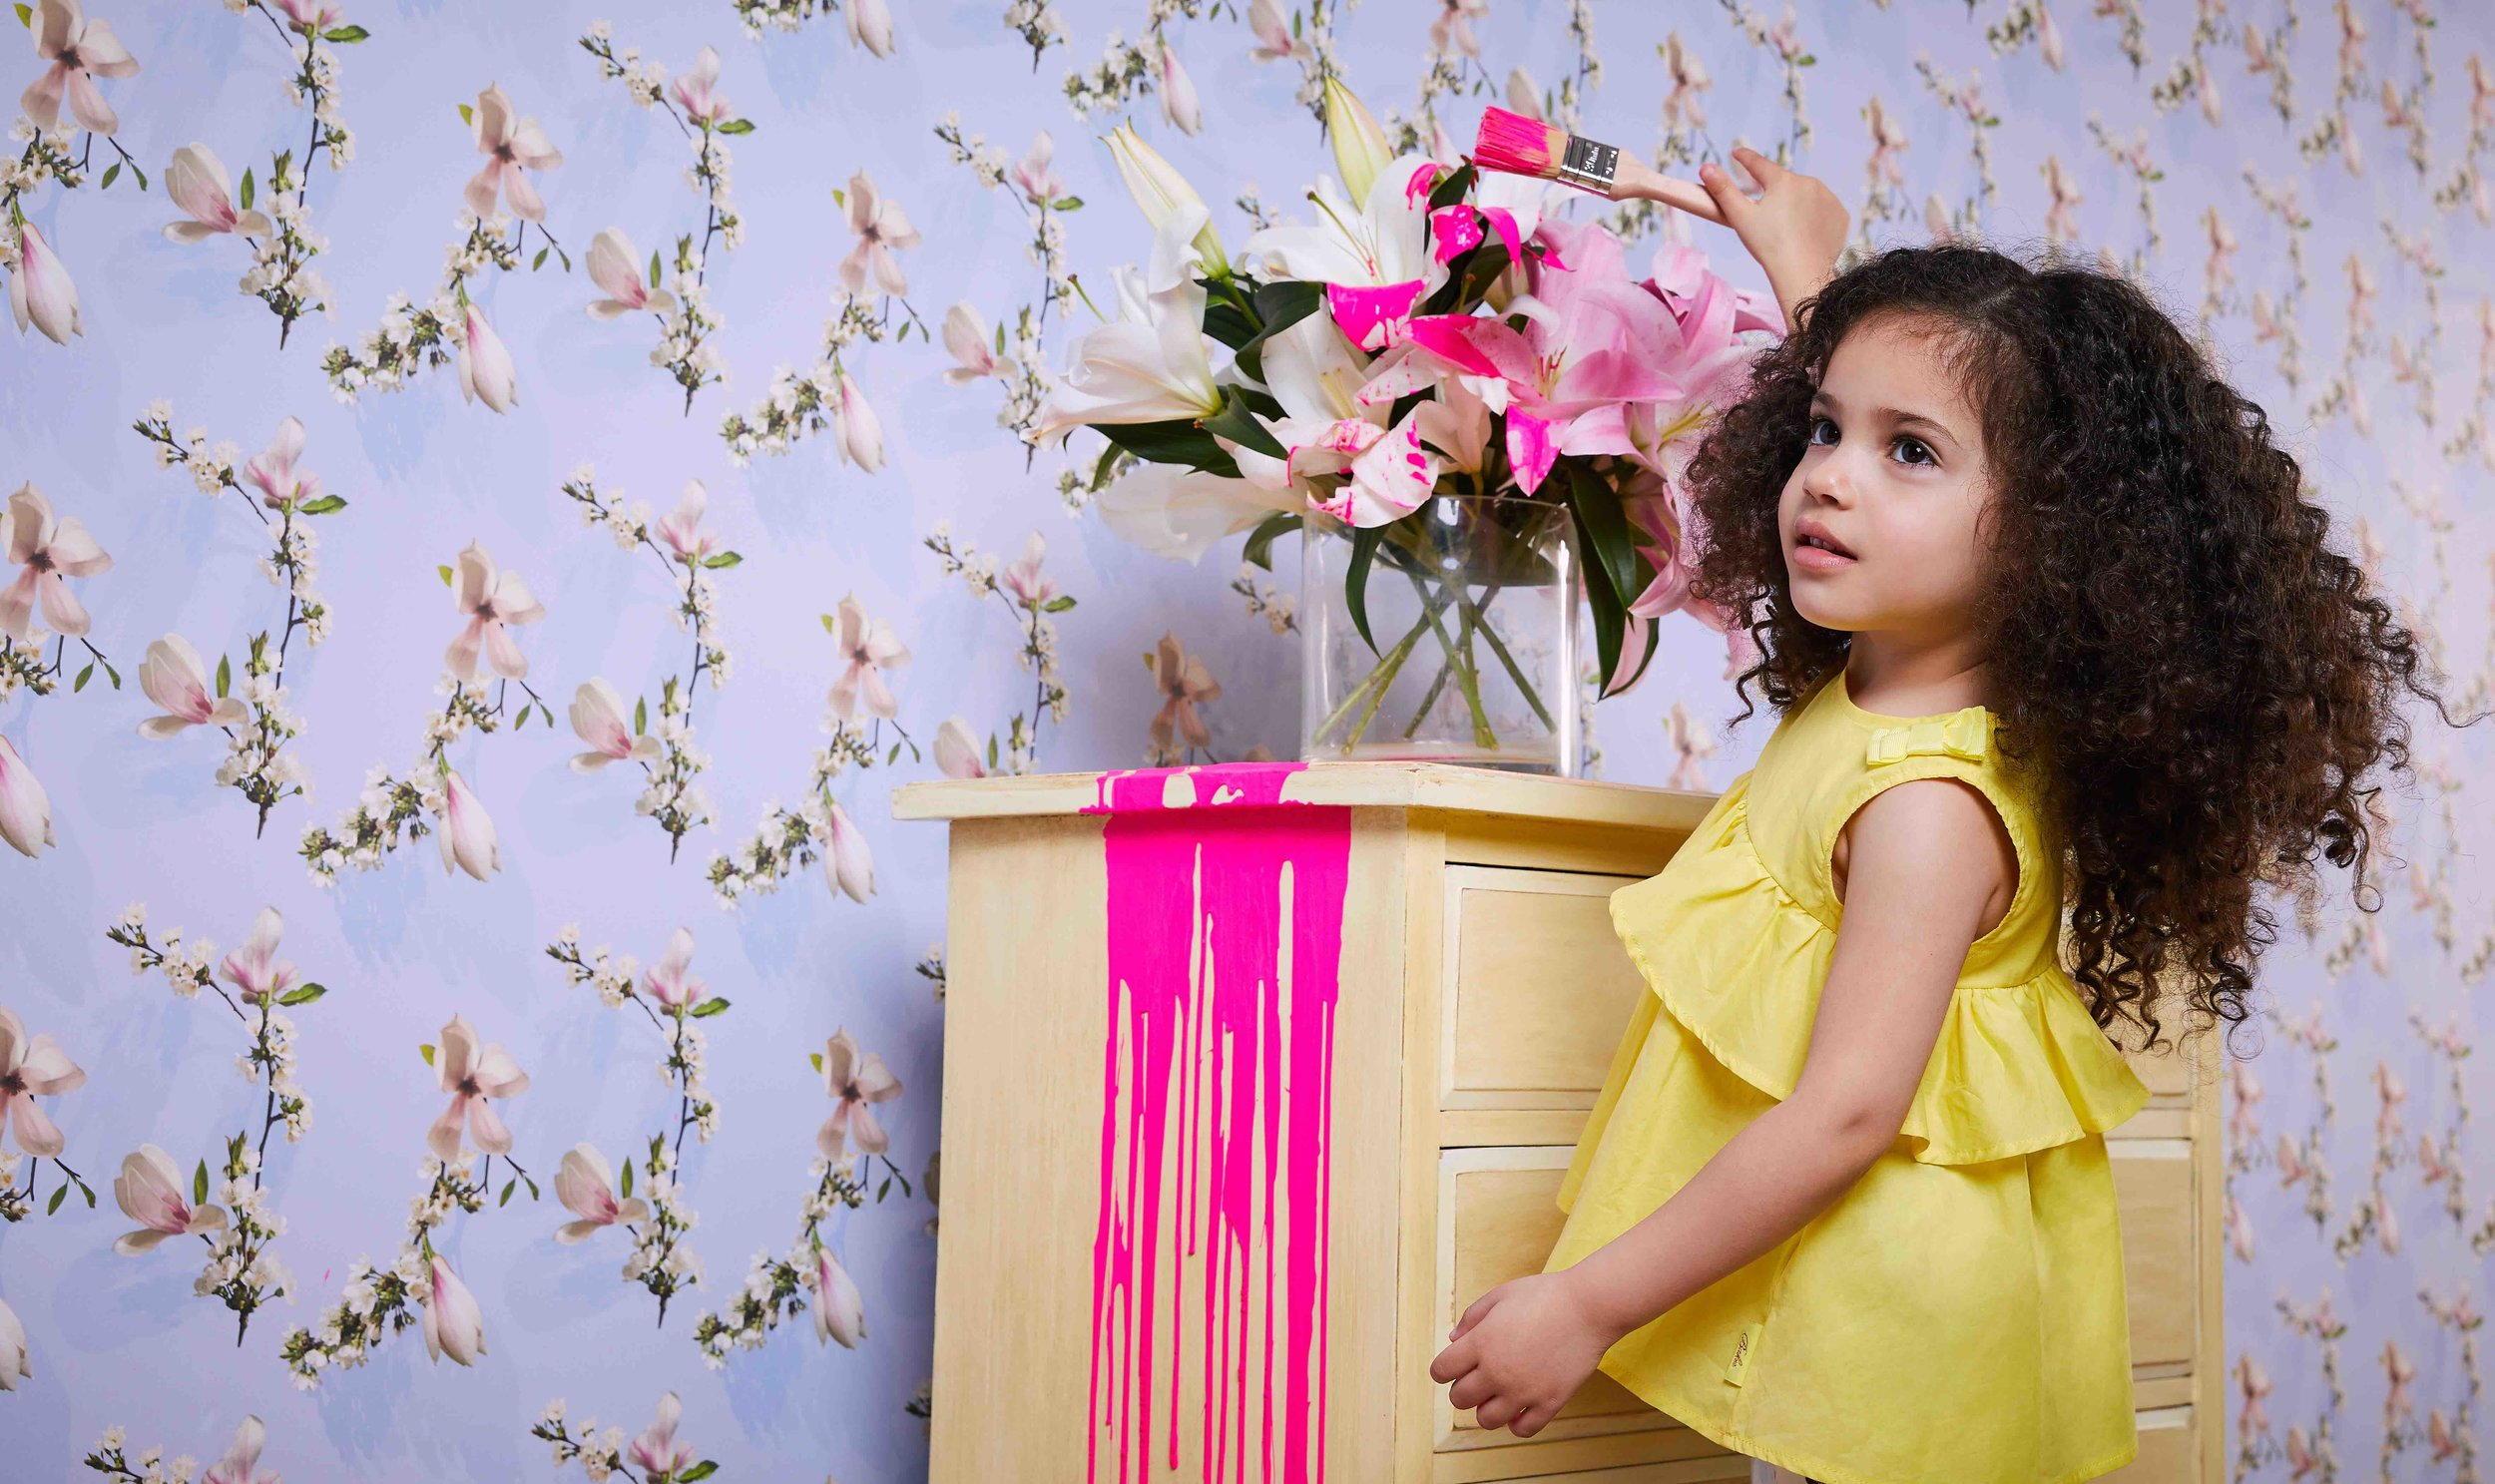 KIDS_CARA_KIDSWEATR_DAY1_6780 1_LOW_RES__JPG_RGB copy.jpg